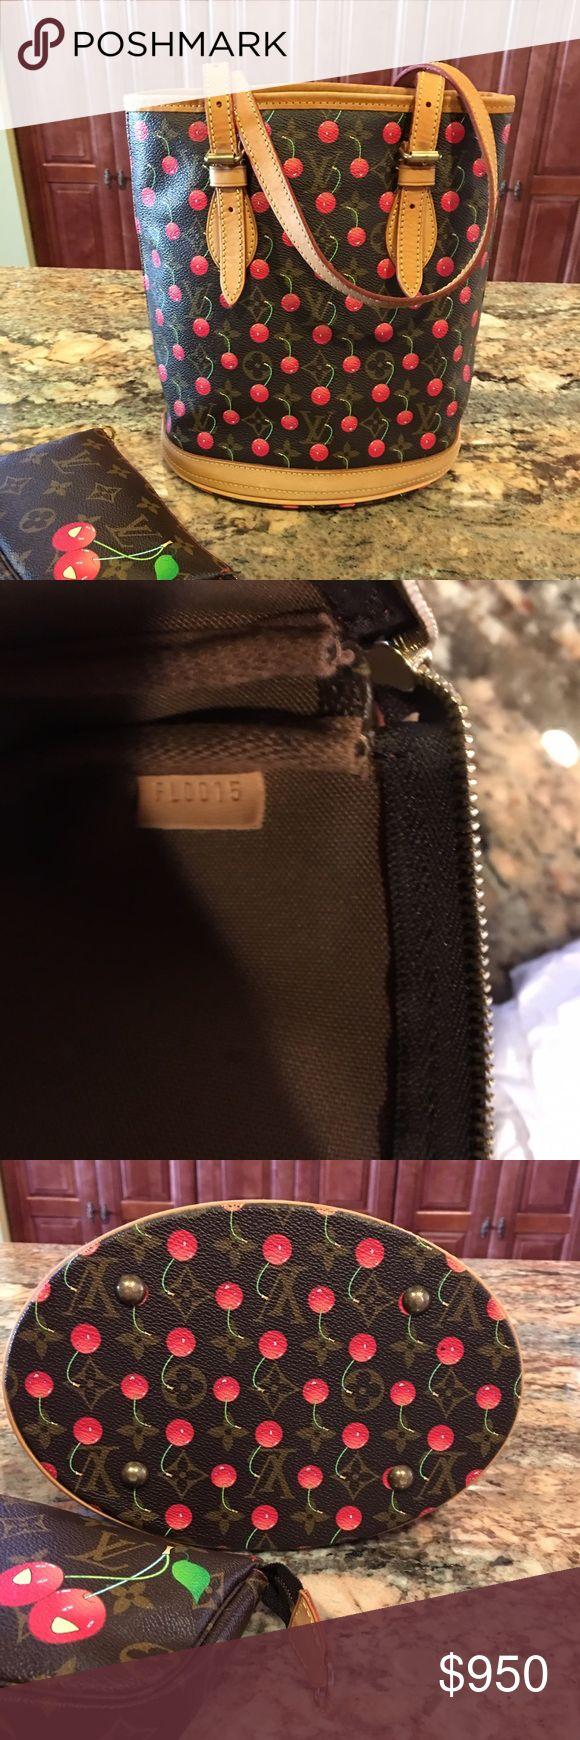 Authentic Louis Vuitton Cerises bucket bag Authentic Louis Vuitton Cerises bucket bag. Excellent condition. Light honey on the vachetta. No torn or damage. Come with detachable pochette only. Louis Vuitton Bags Shoulder Bags